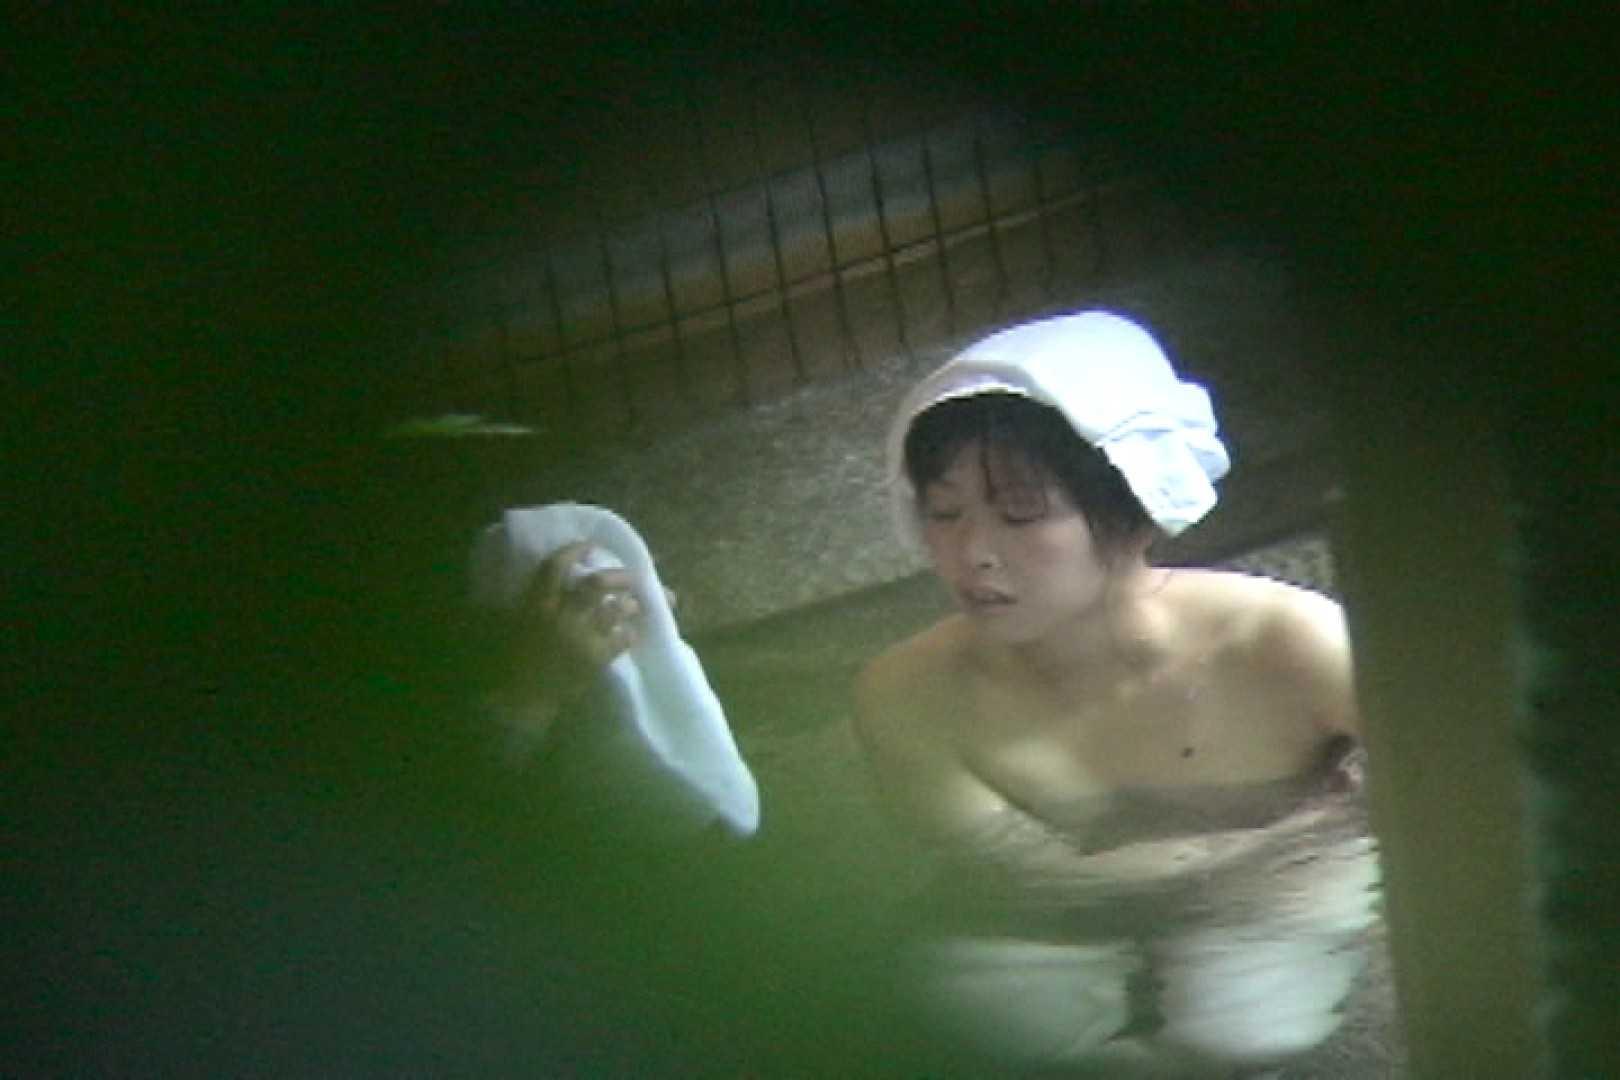 Aquaな露天風呂Vol.701 盗撮大放出 セックス無修正動画無料 89連発 73